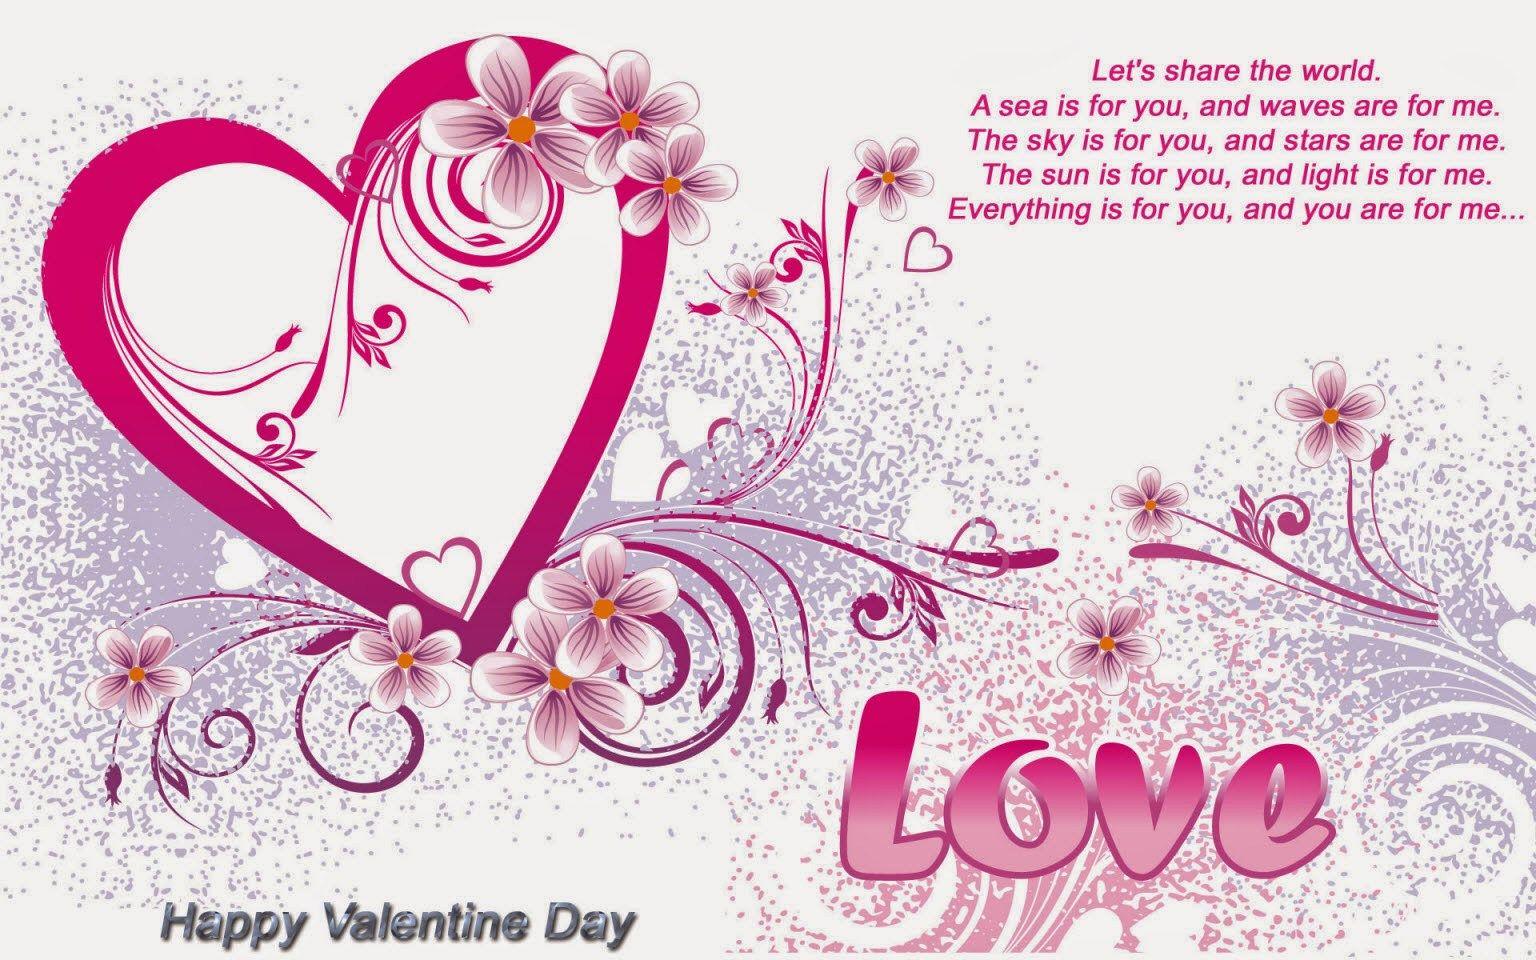 Valentines Day Romantic love letter ideas wishes for boyfriend